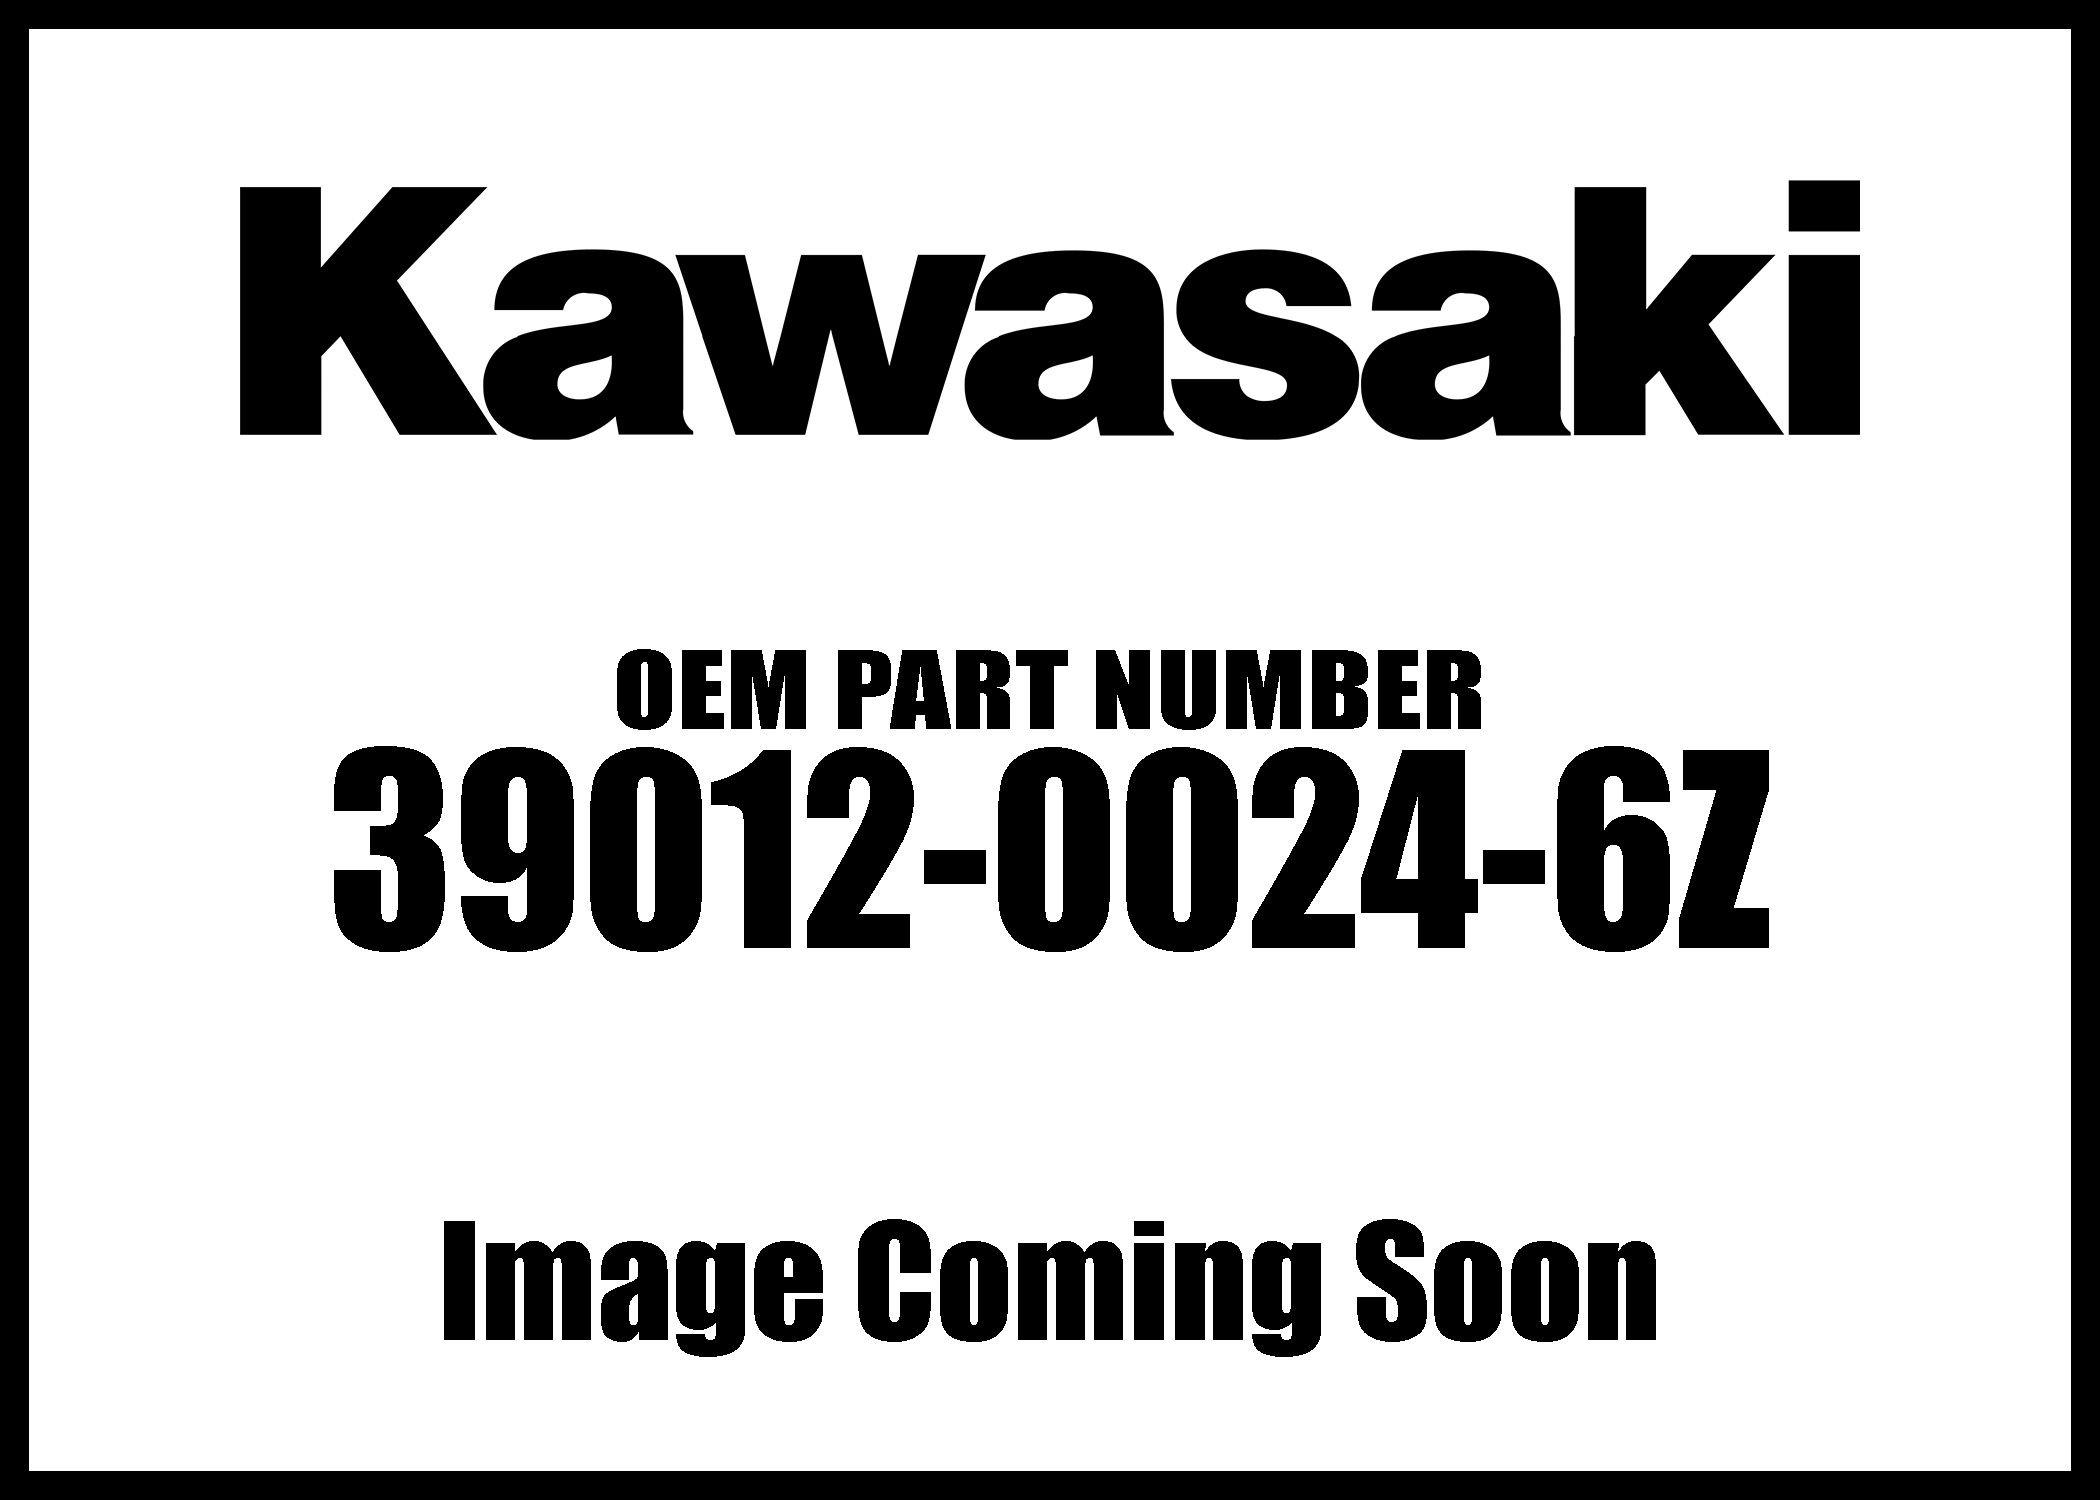 Kawasaki 2008-2013 Teryx 750 4X4 Le Teryx 750 Fi 4X4 Le Sge Storage F Black Case 39012-0024-6Z New Oem